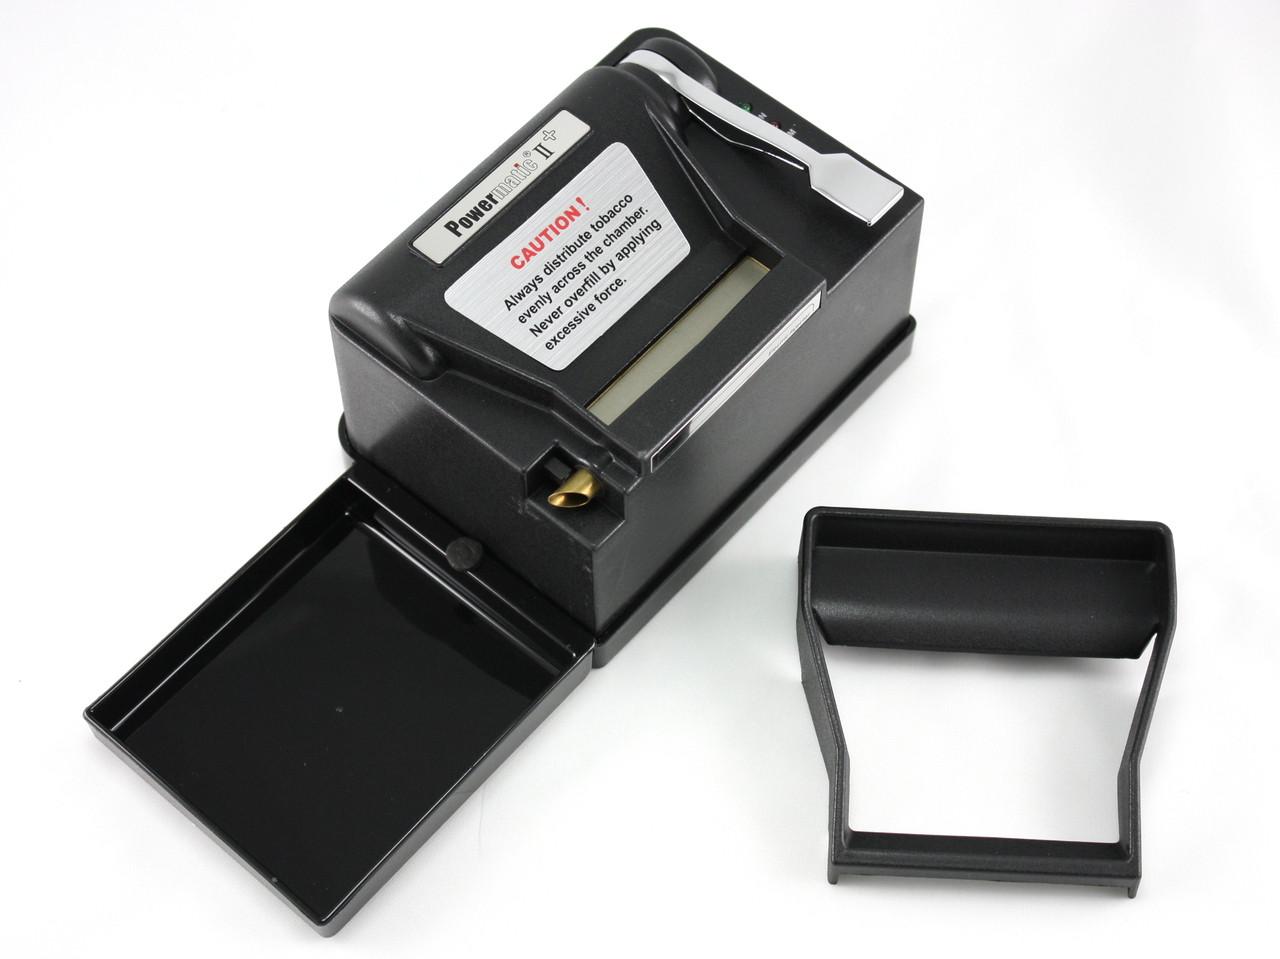 Powermatic II Electric Cigarette Rolling Machine